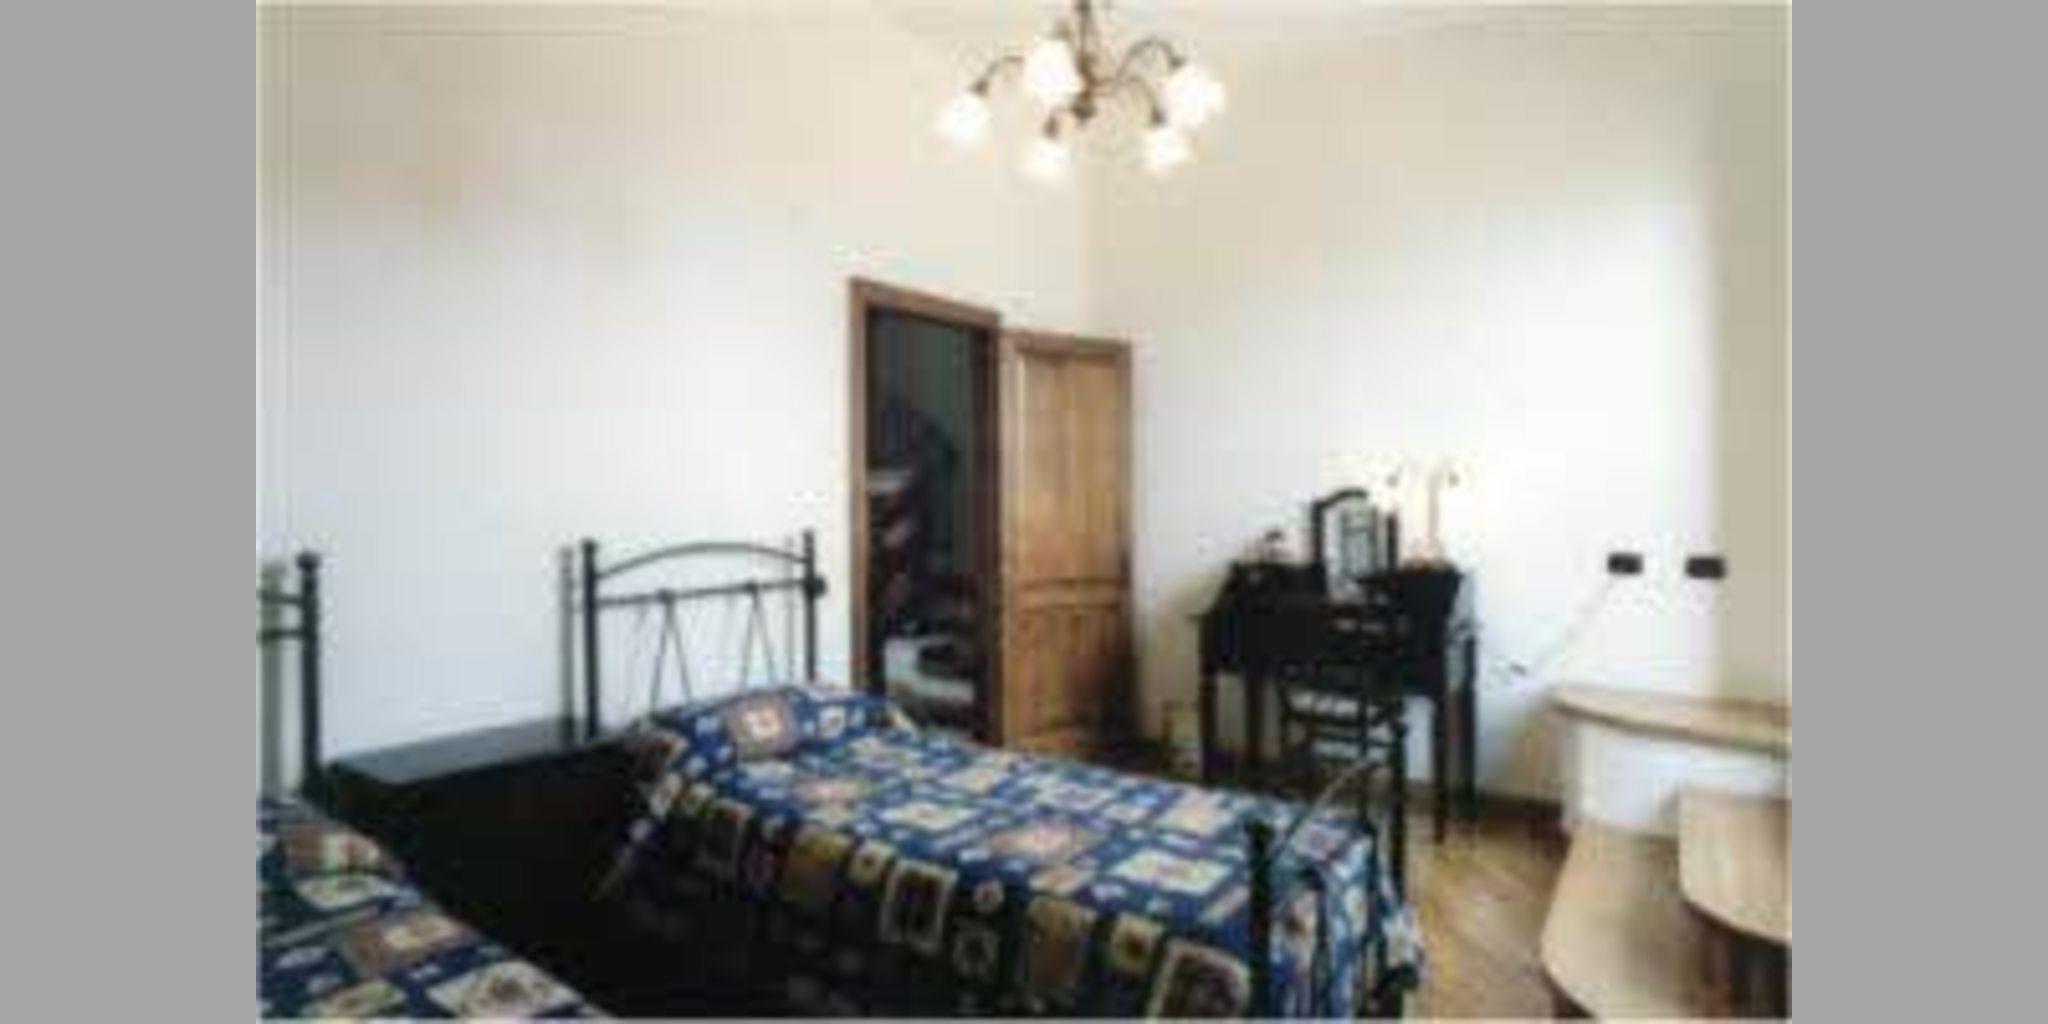 Bed & Breakfast Morano Calabro - Campotenese